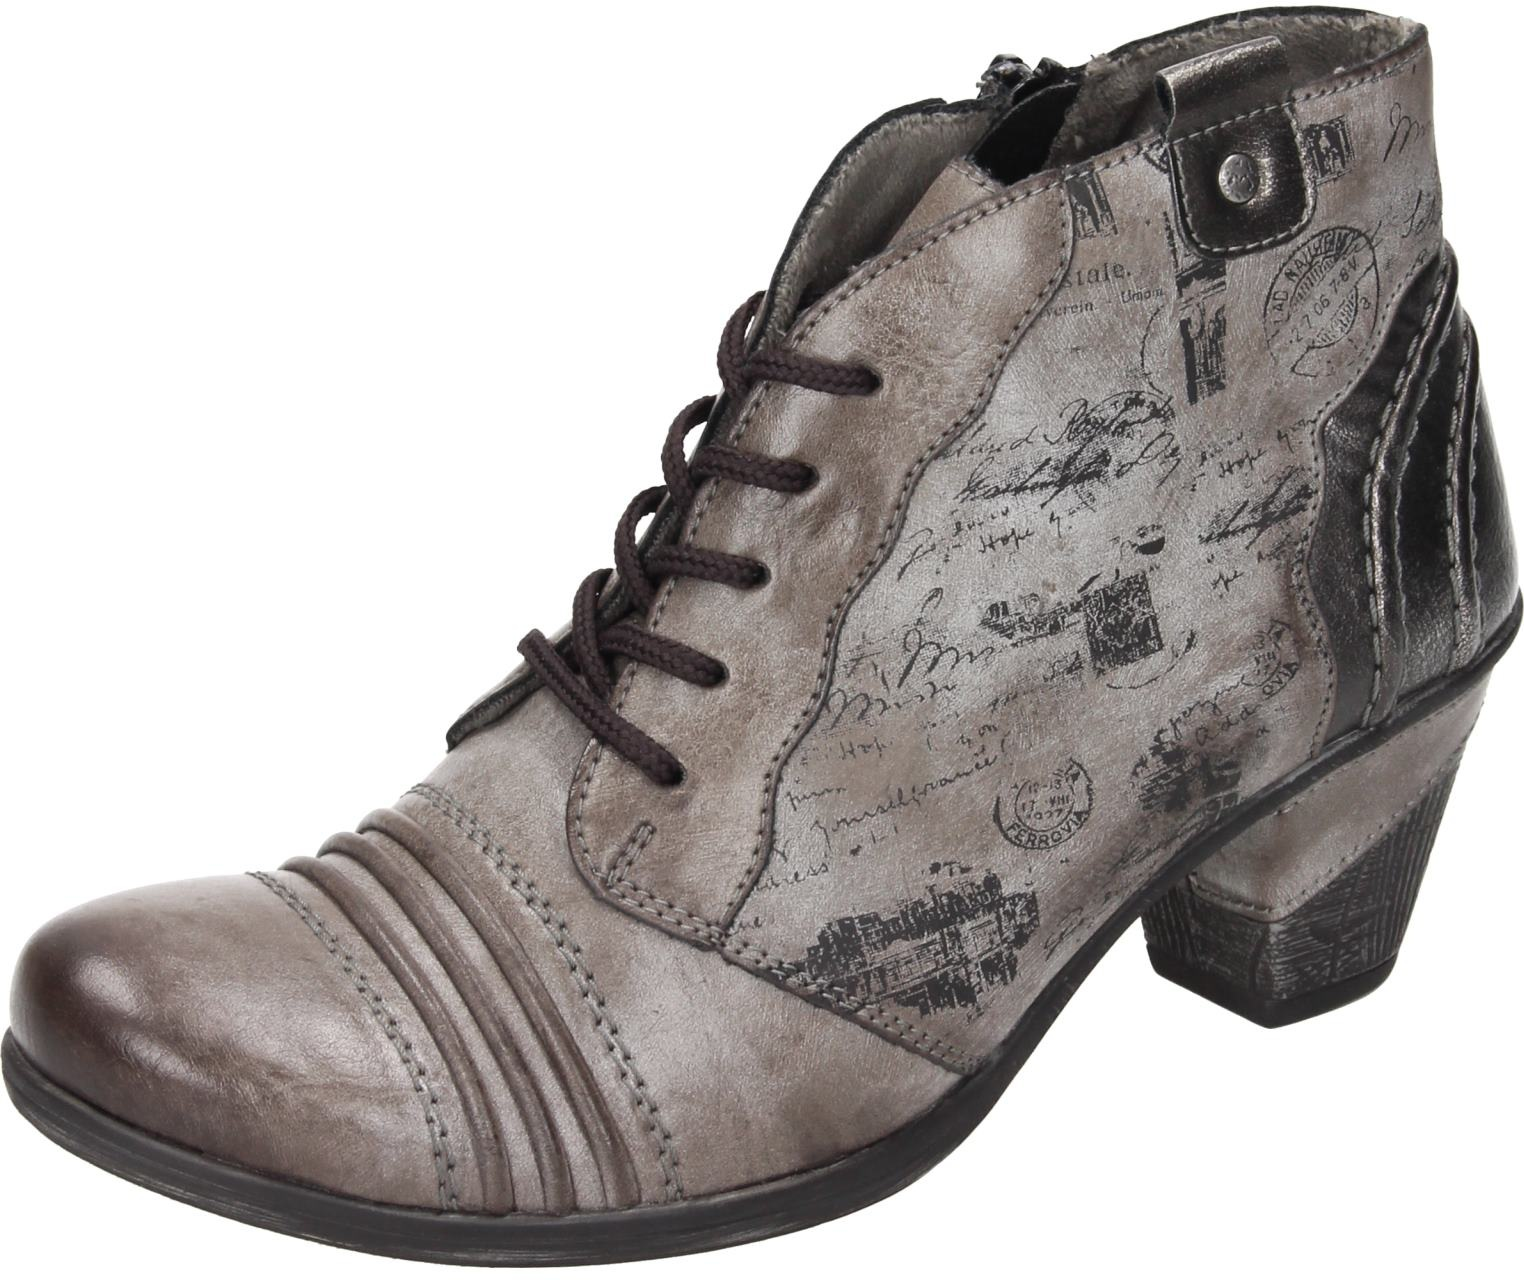 Remonte Damen Schuhe Damen-Stiefelette - F 1 2 grau Synthetik NEU